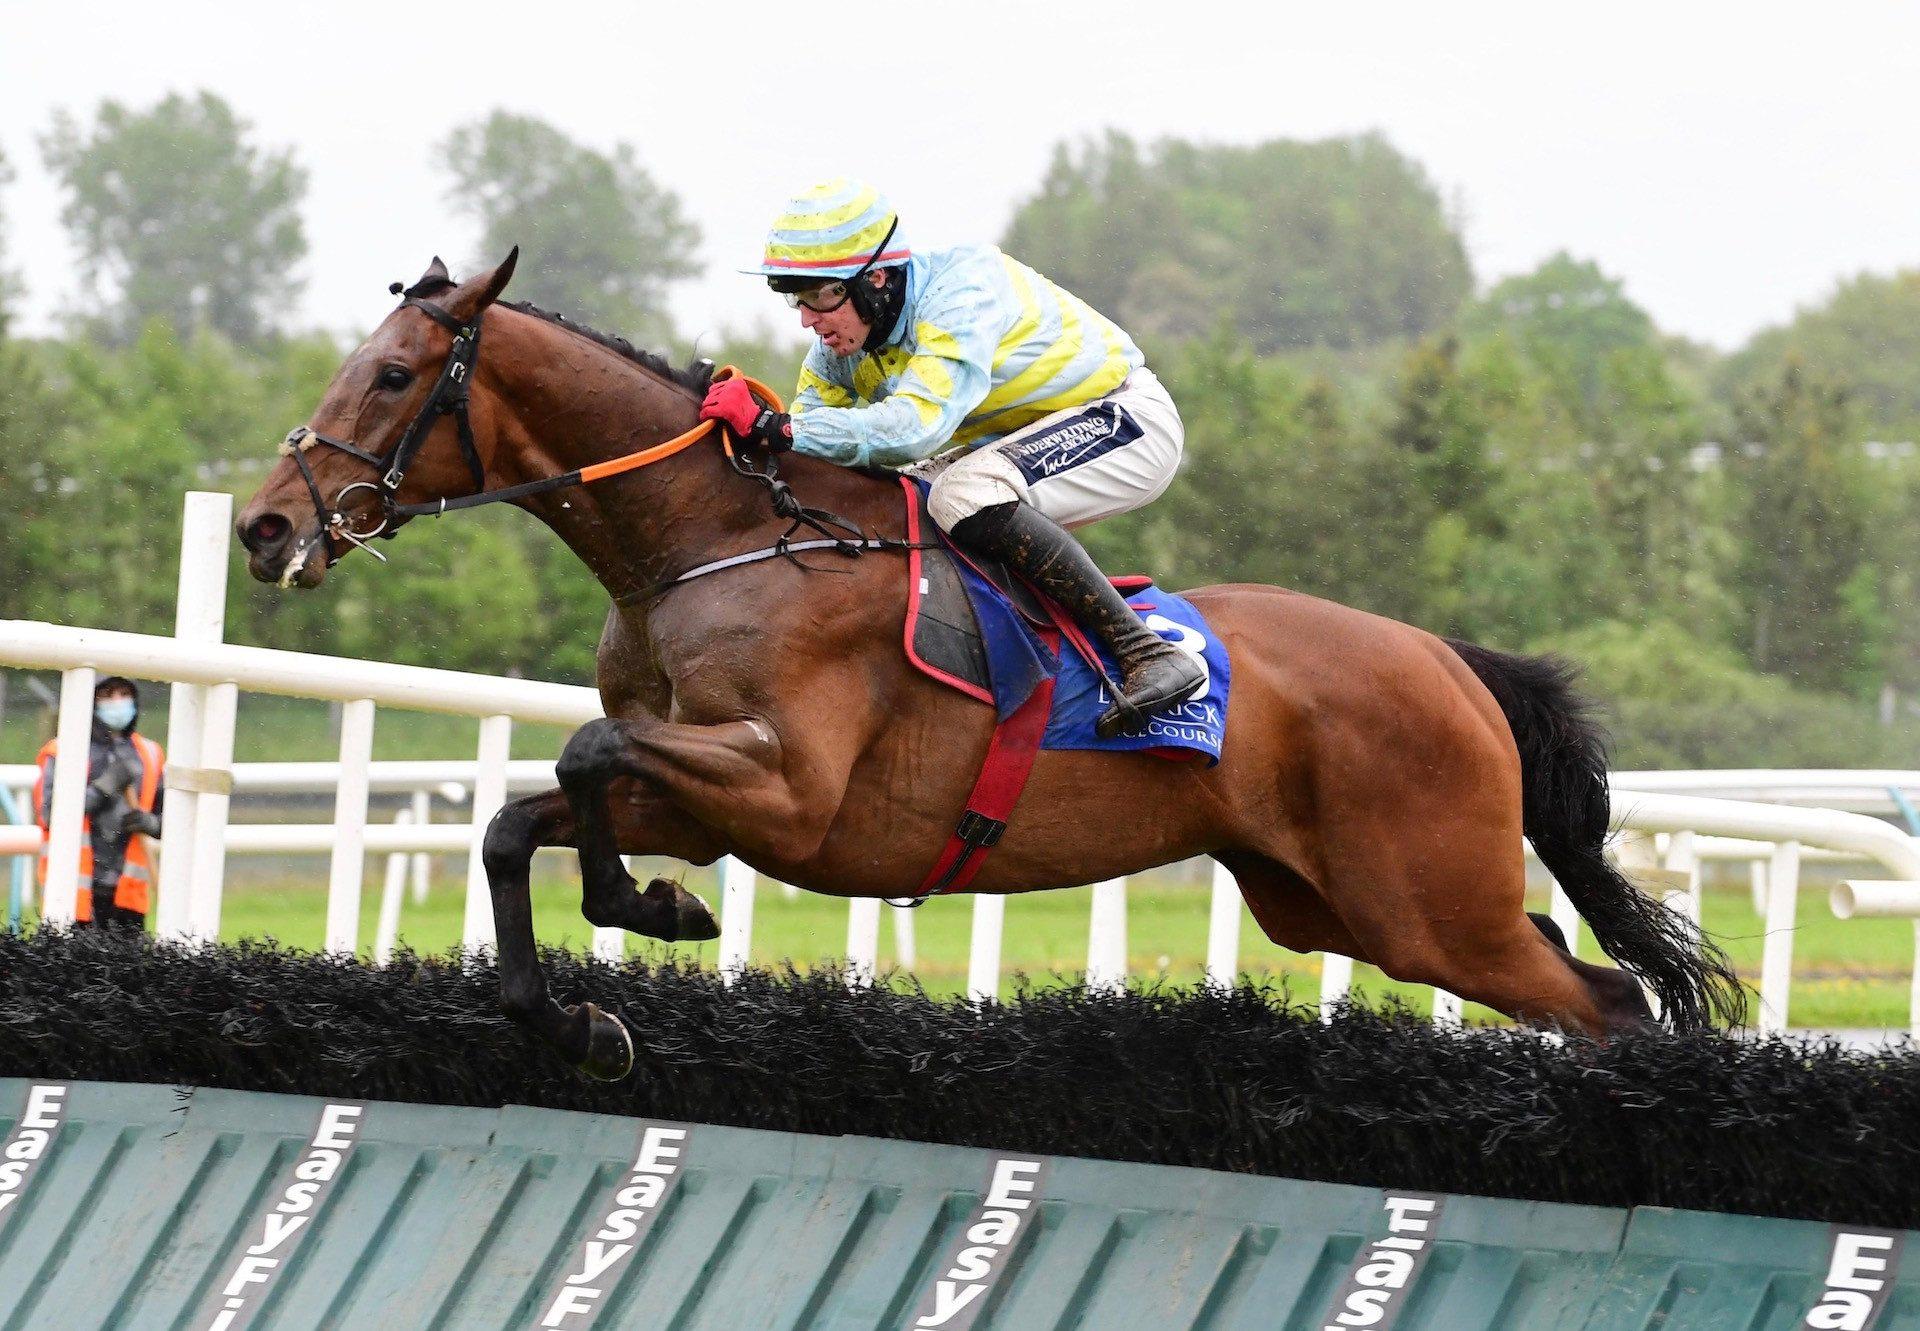 Benbulben Boy (Yeats) Wins The Maiden Hurdle At Limerick